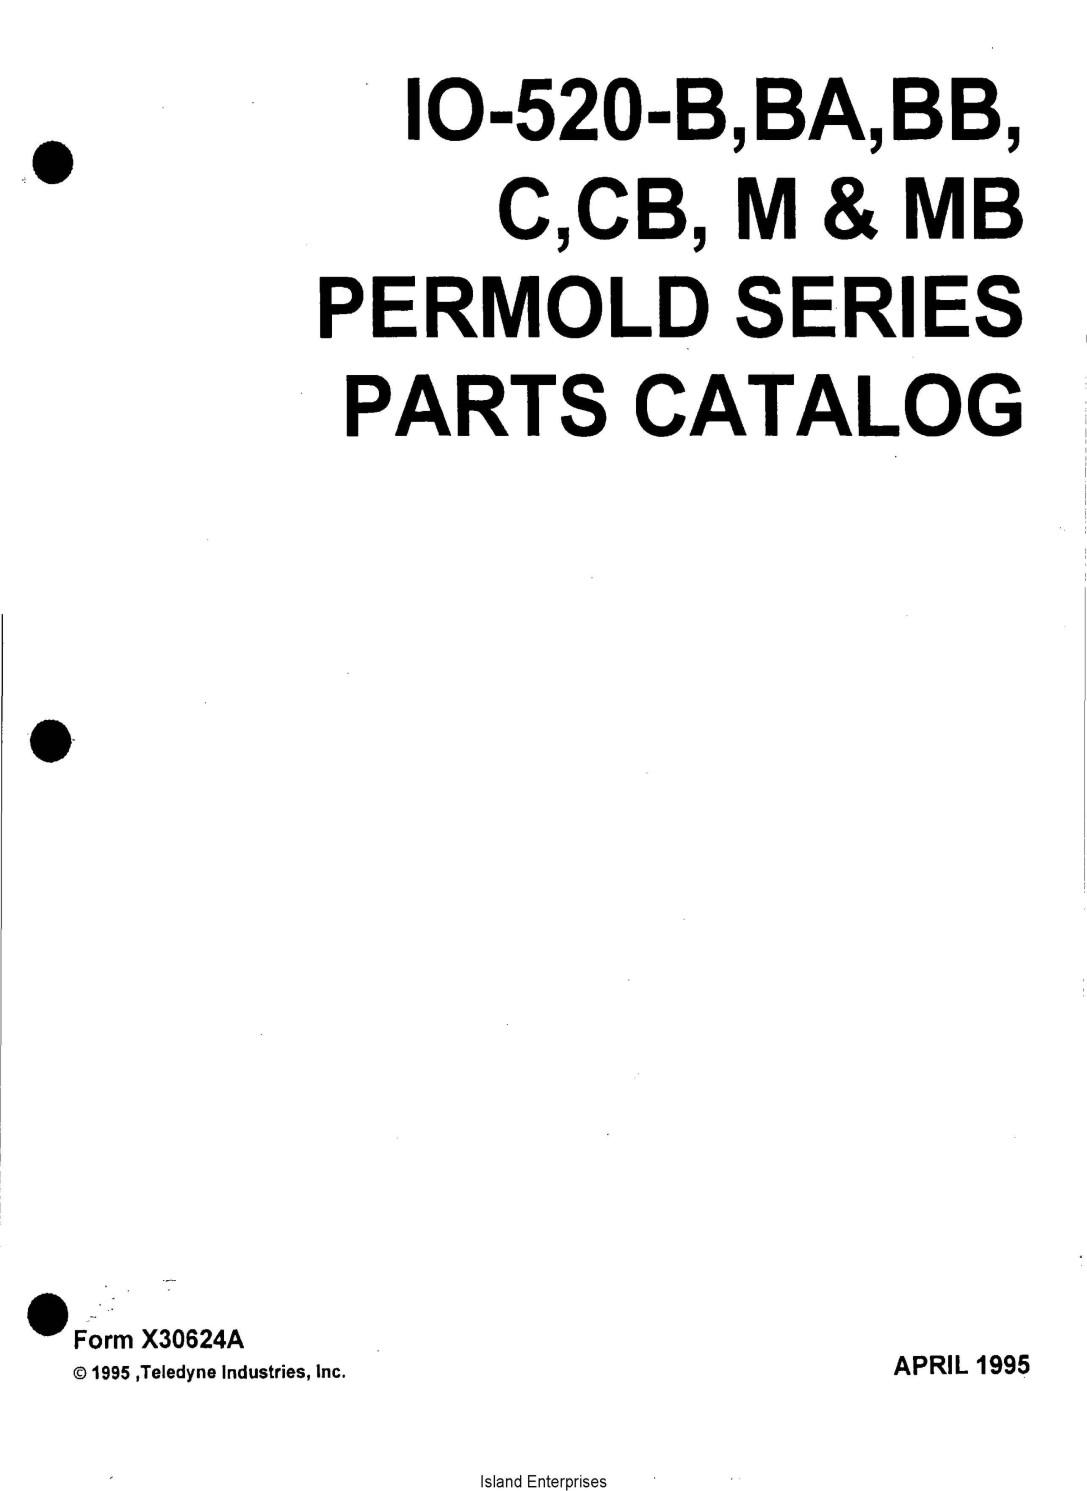 Continental IO-520-B,BA,BB, C,CB, M & MB Permold Series